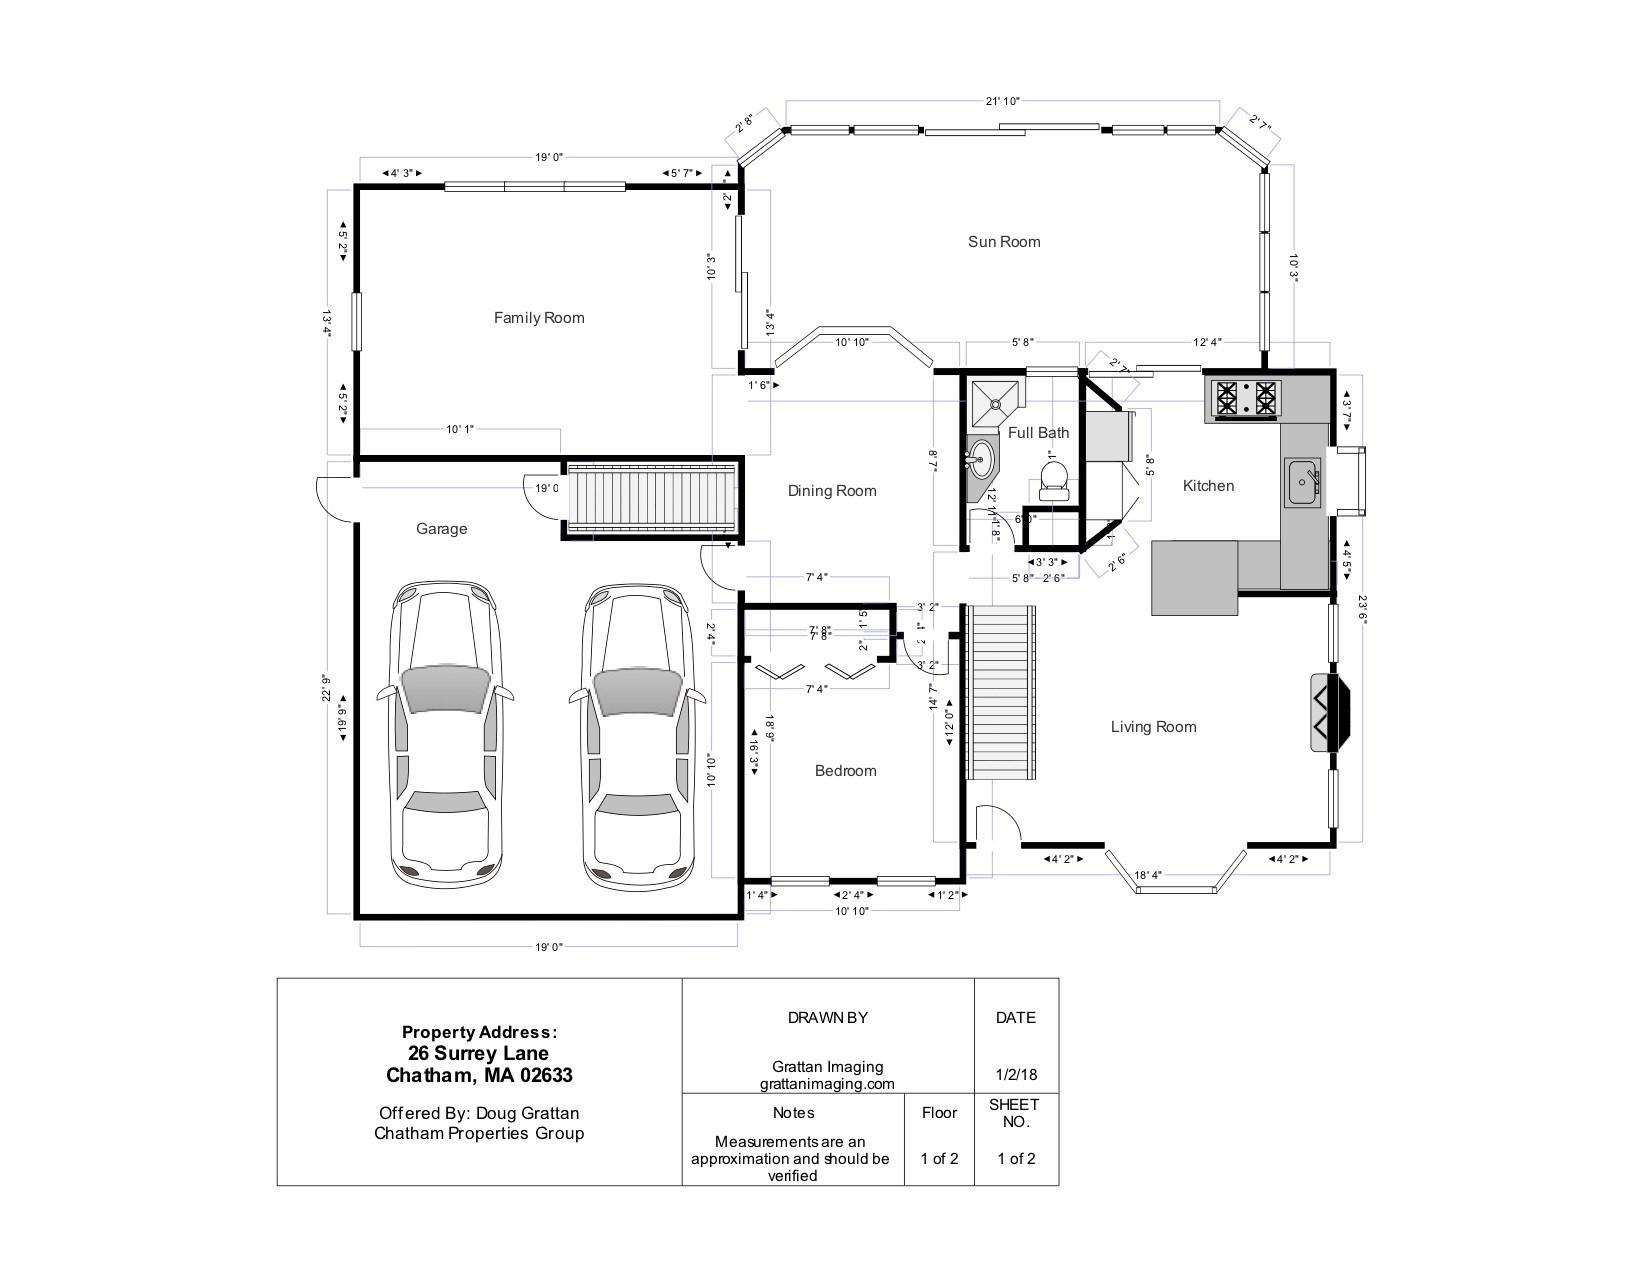 26 Surrey Lane, Chatham MA, 02633 - slide 34